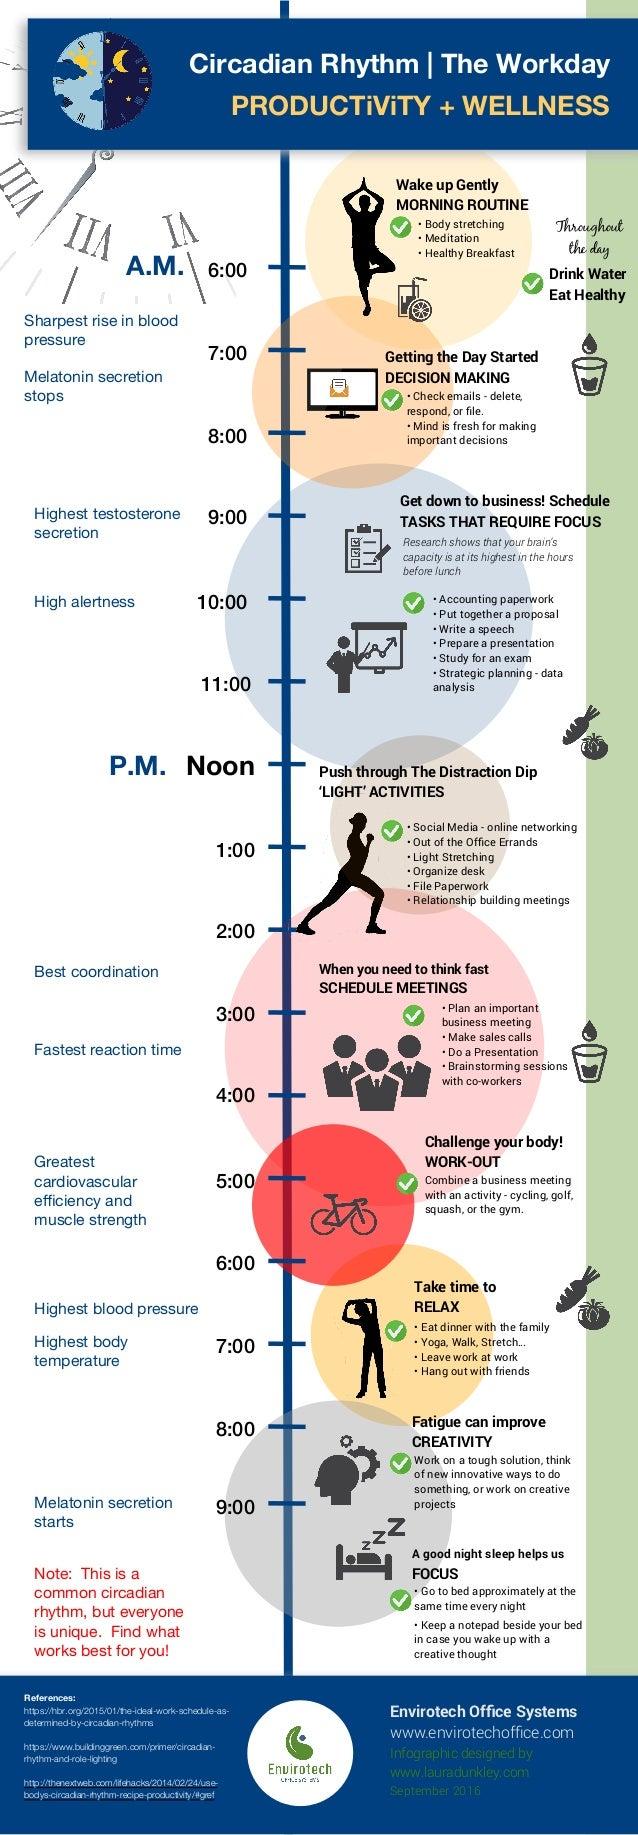 A.M. 6:00 9:00 10:00 3:00 5:00 6:00 7:00 9:00 Noon Sharpest rise in blood pressure Melatonin secretion stops High alertnes...